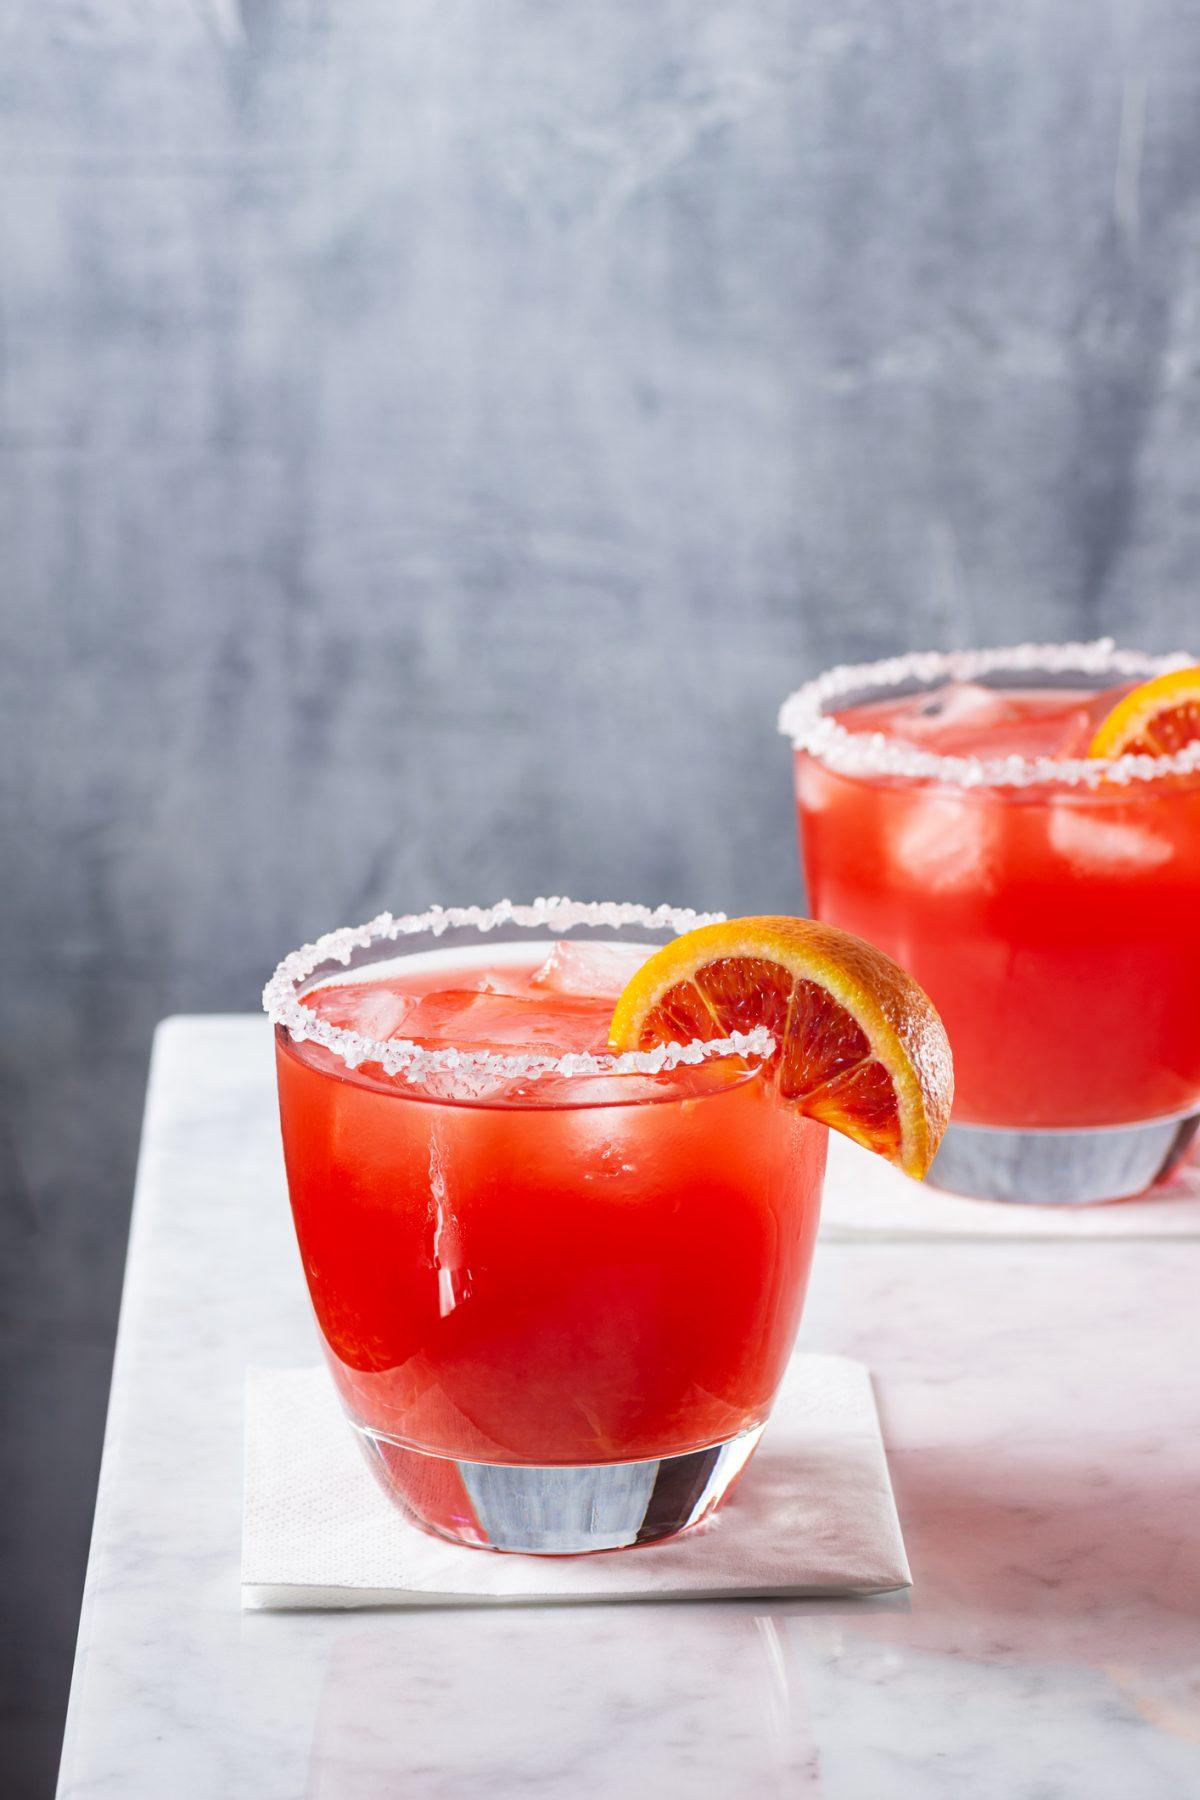 Blood orange cocktail with sugared rim.